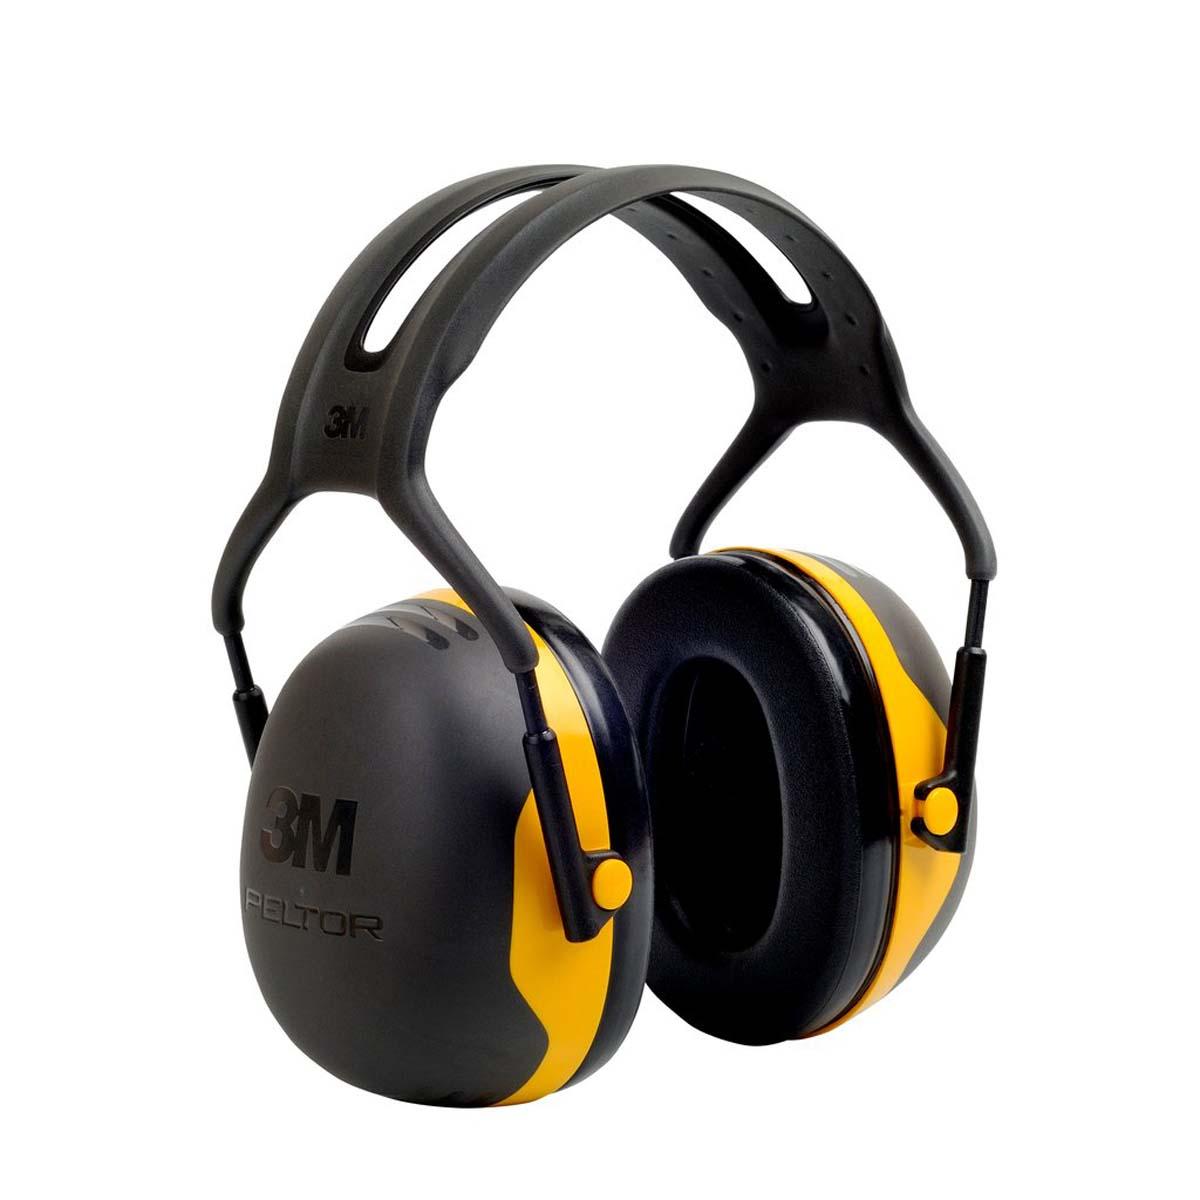 "3Mâ""¢ PELTORâ""¢ Over-the-Head Earmuffs X2A/37271(AAD)"